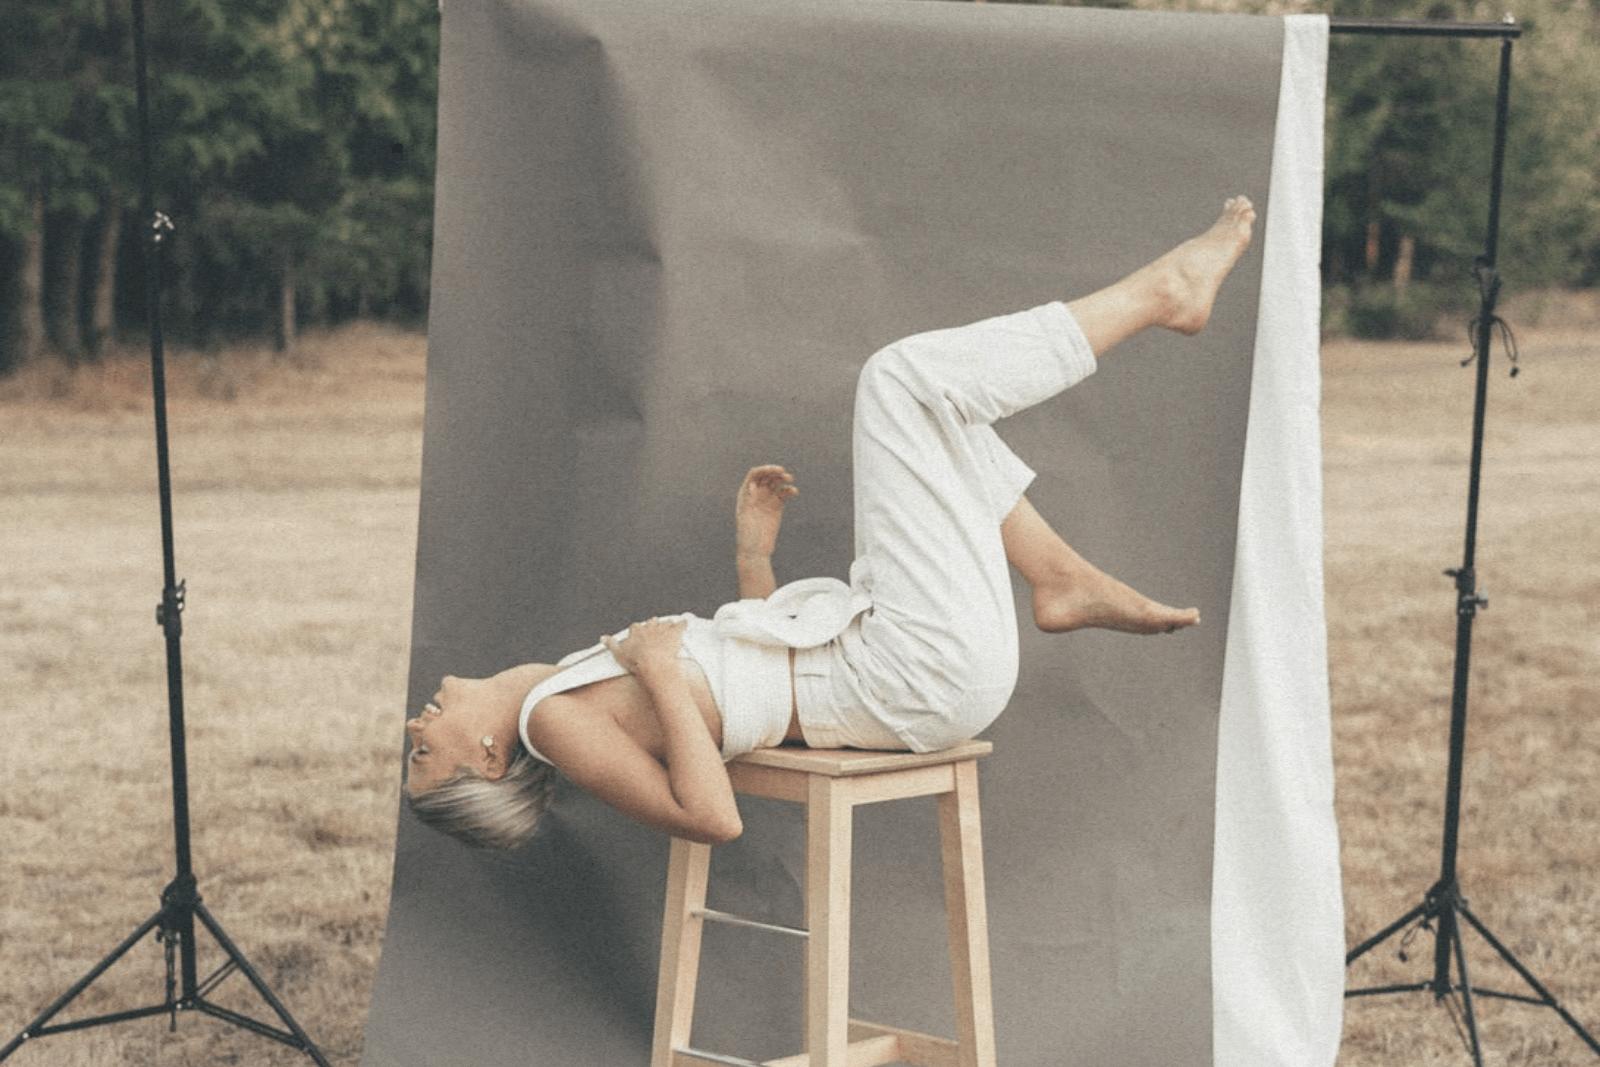 women at photoshoot laughing